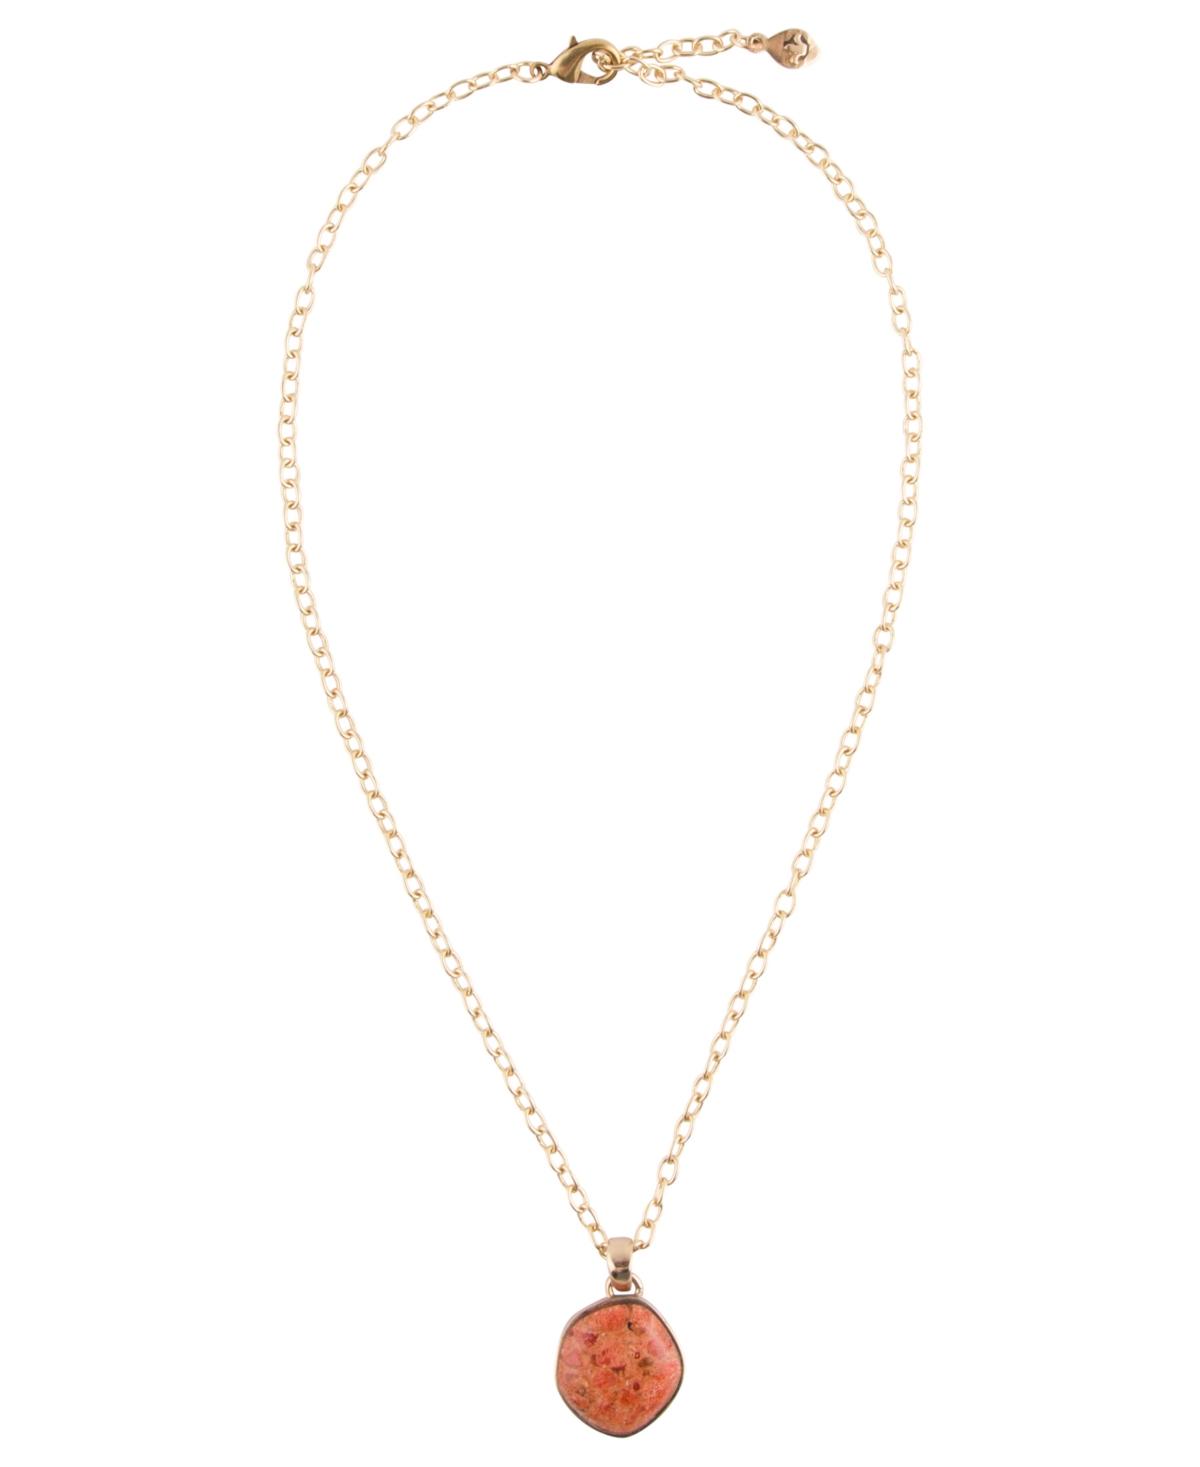 Barse Women's Legend Genuine Bronze and Orange Sponge Coral on Chain Necklace